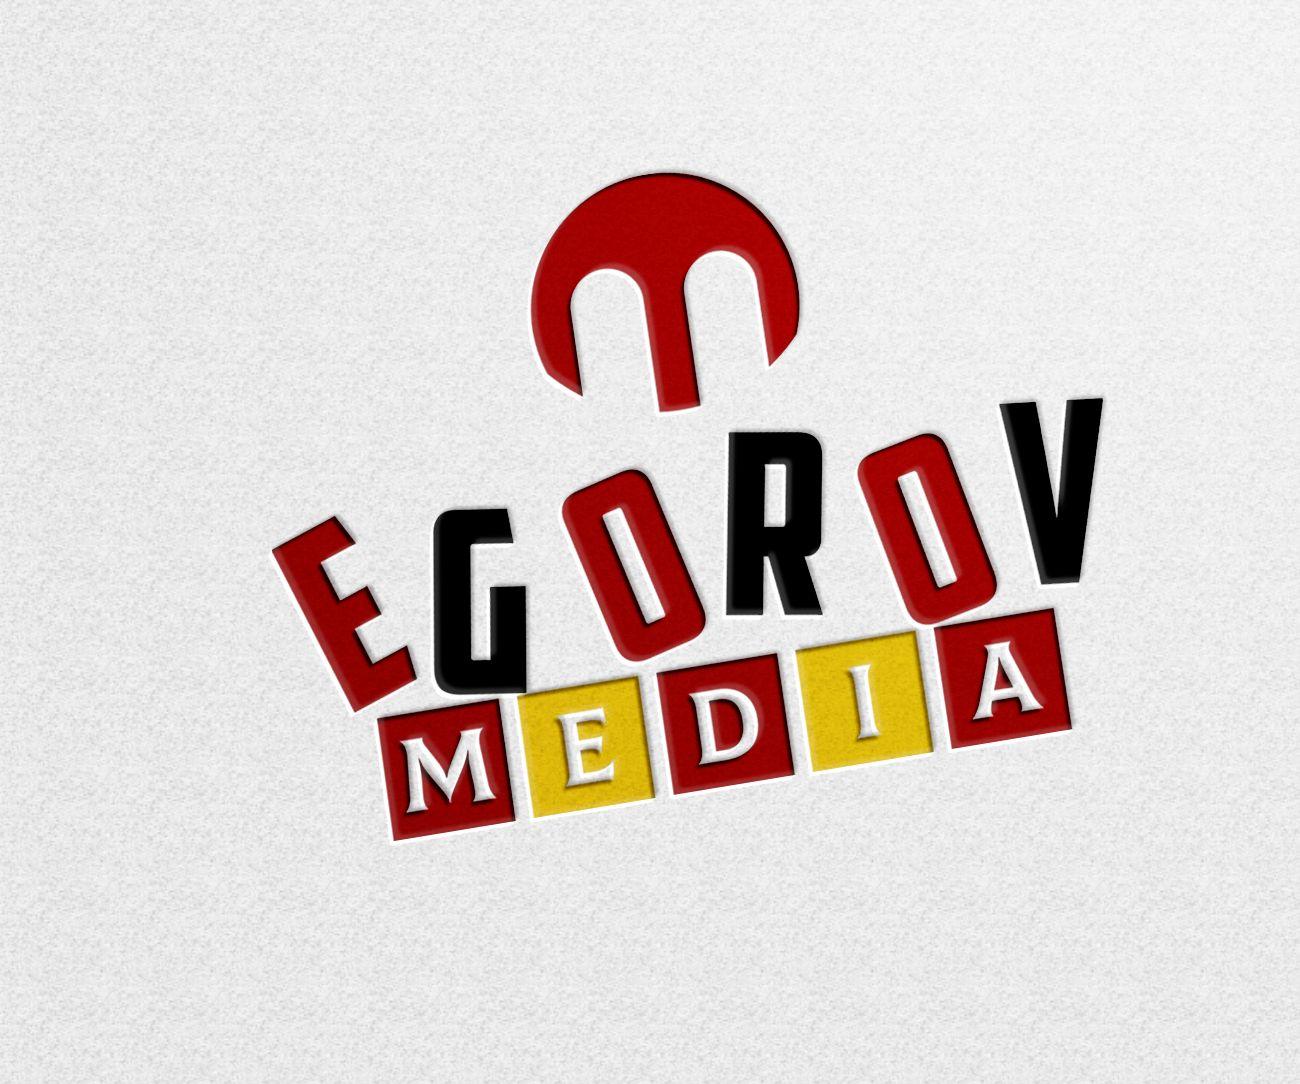 Логотип для Egorov Media - дизайнер ilim1973